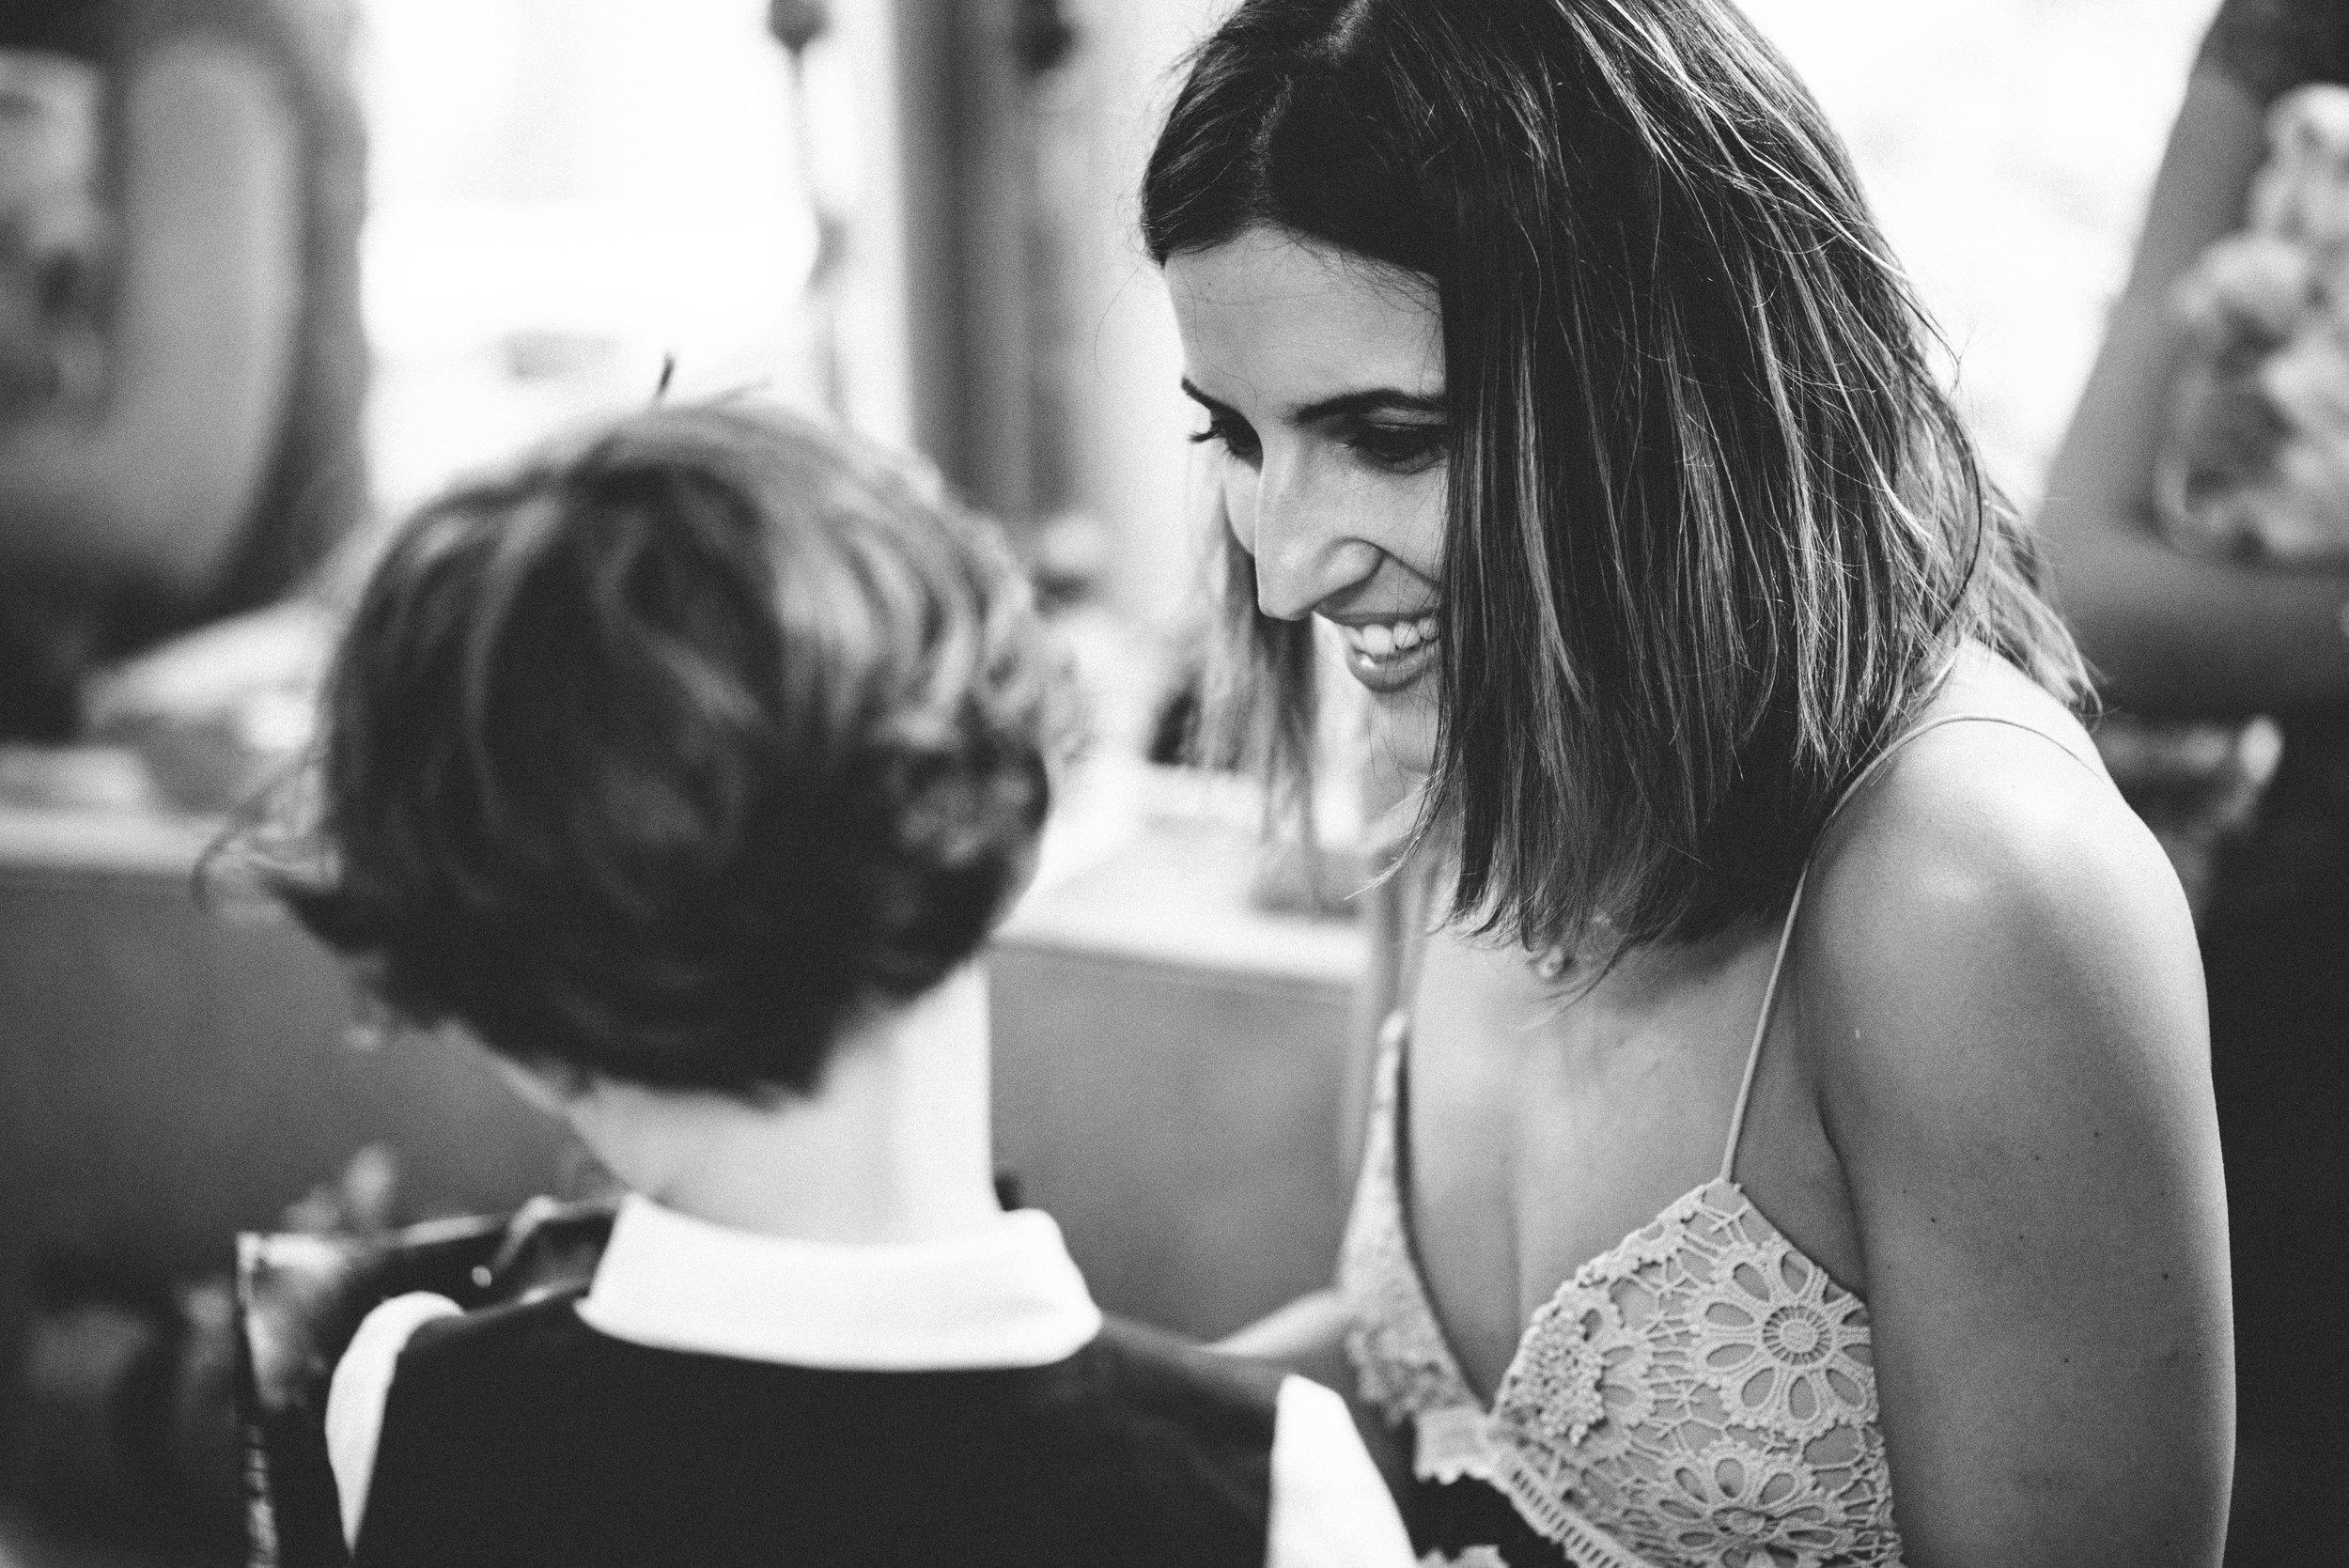 Garden Wedding photography Barley Herefordshire - Tracy + Matt -51.jpg